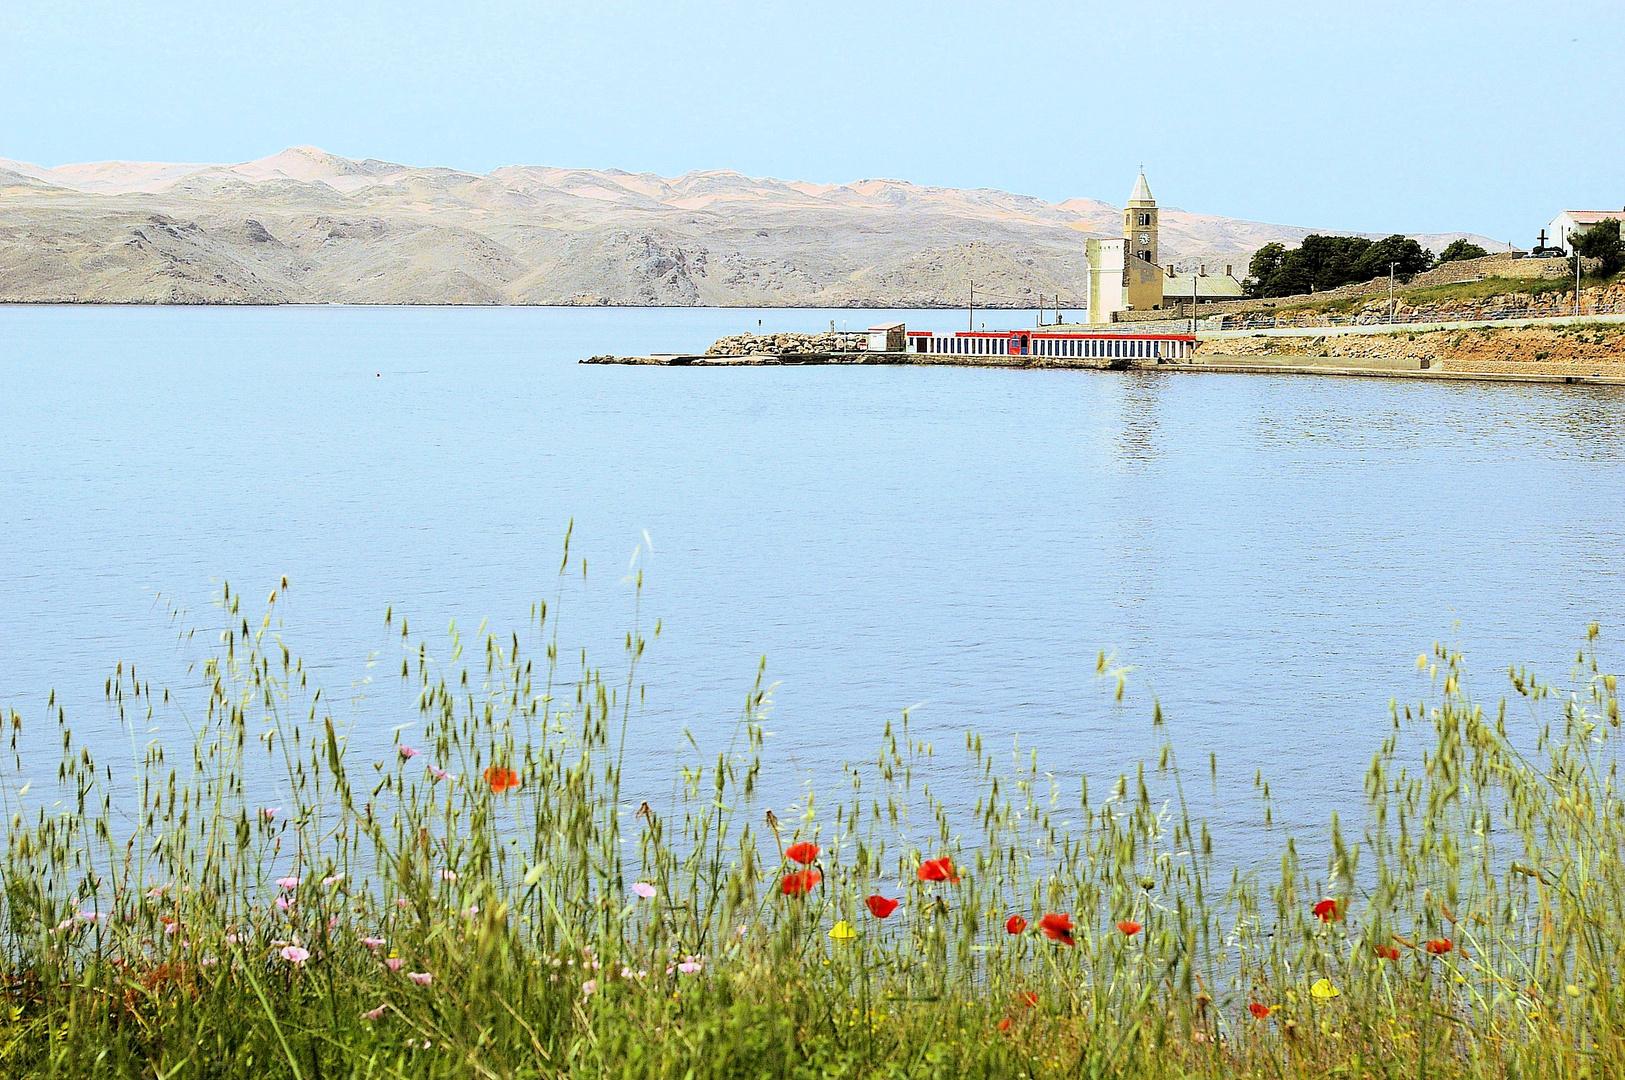 Morgenstimmung bei Karlobag am Velebitski Kanal